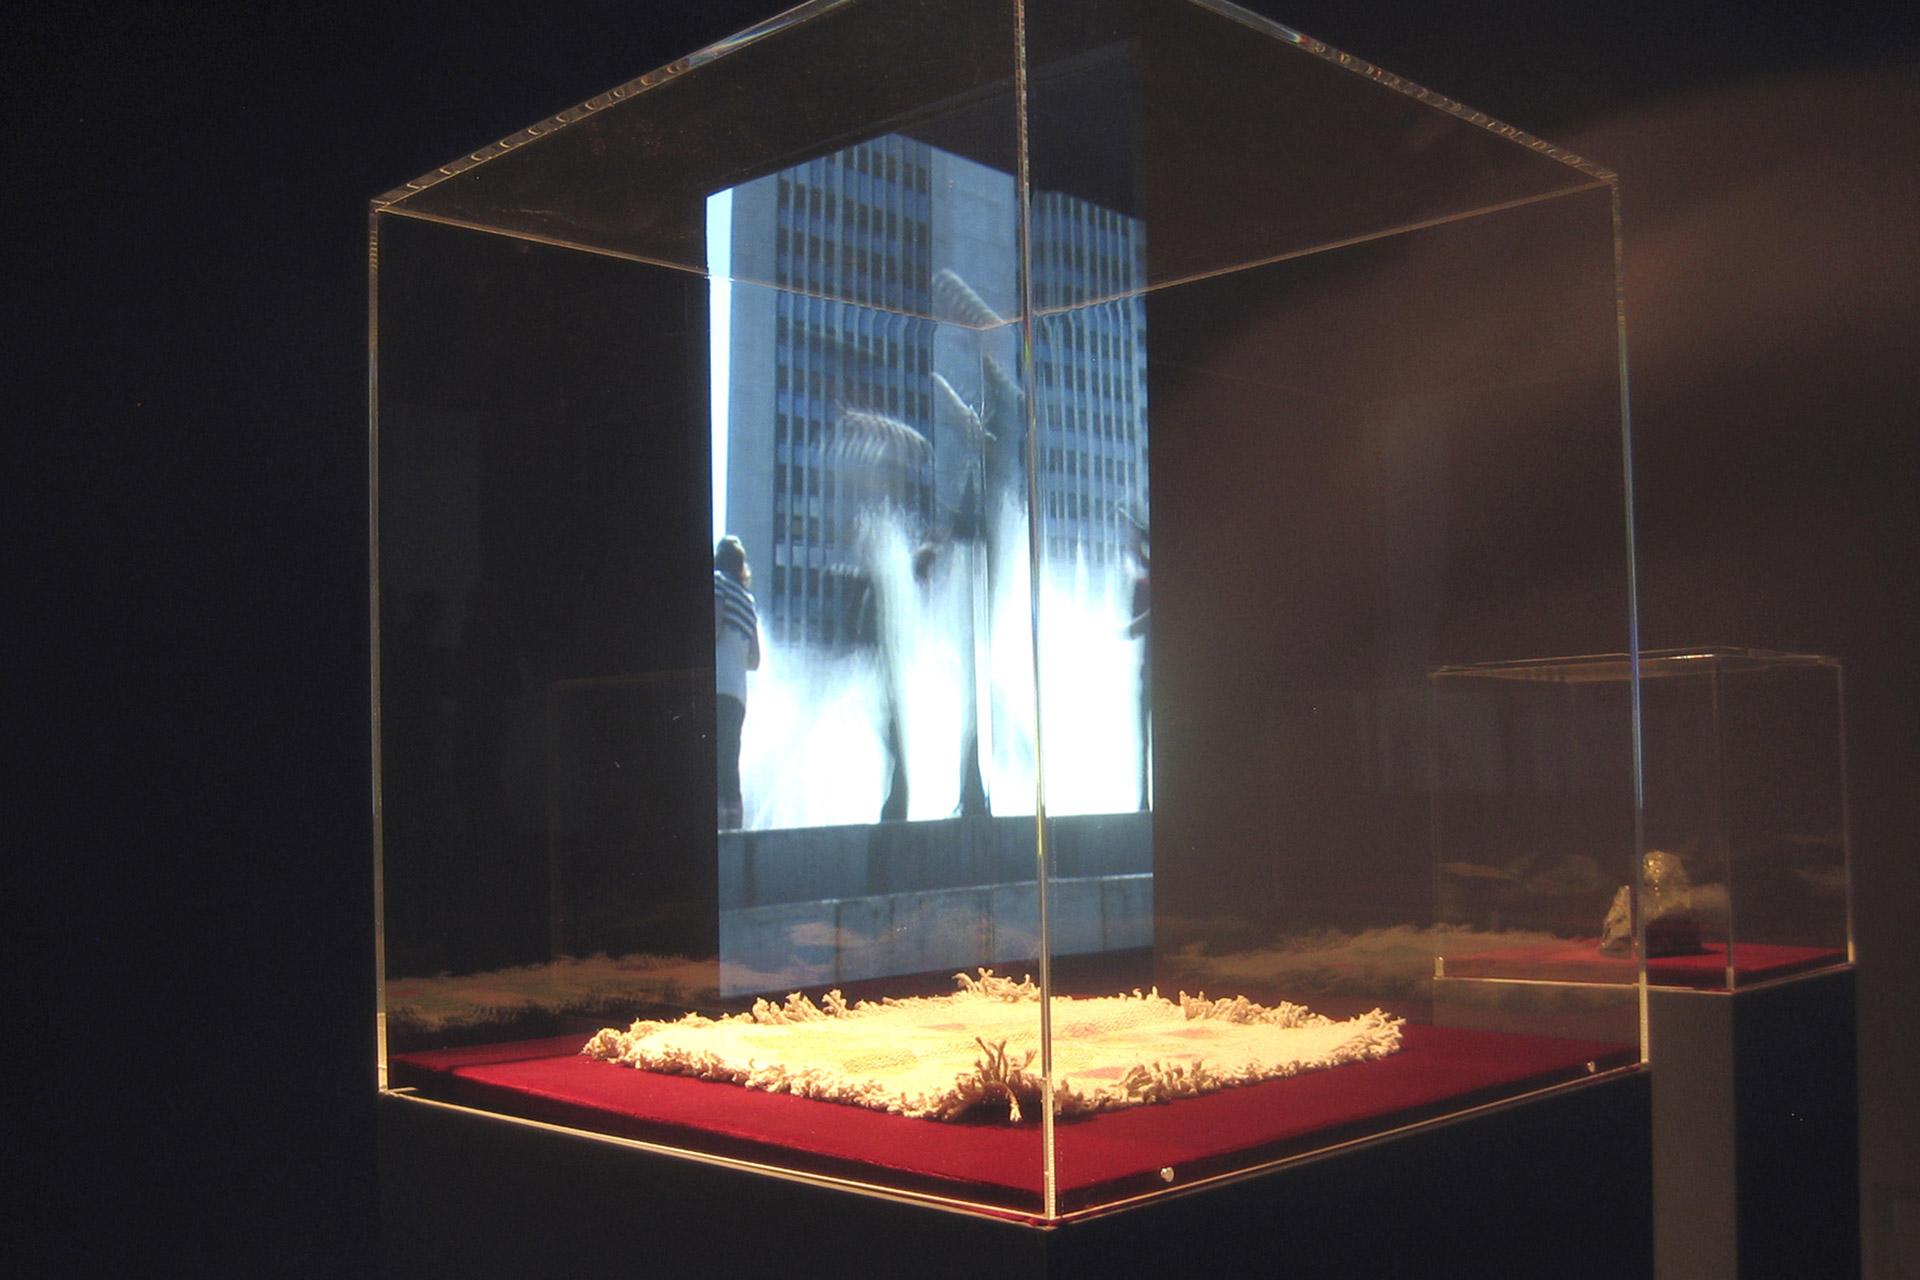 Aleksander-Komarov-Kunsthalle-Winterthur-2008-2.jpg